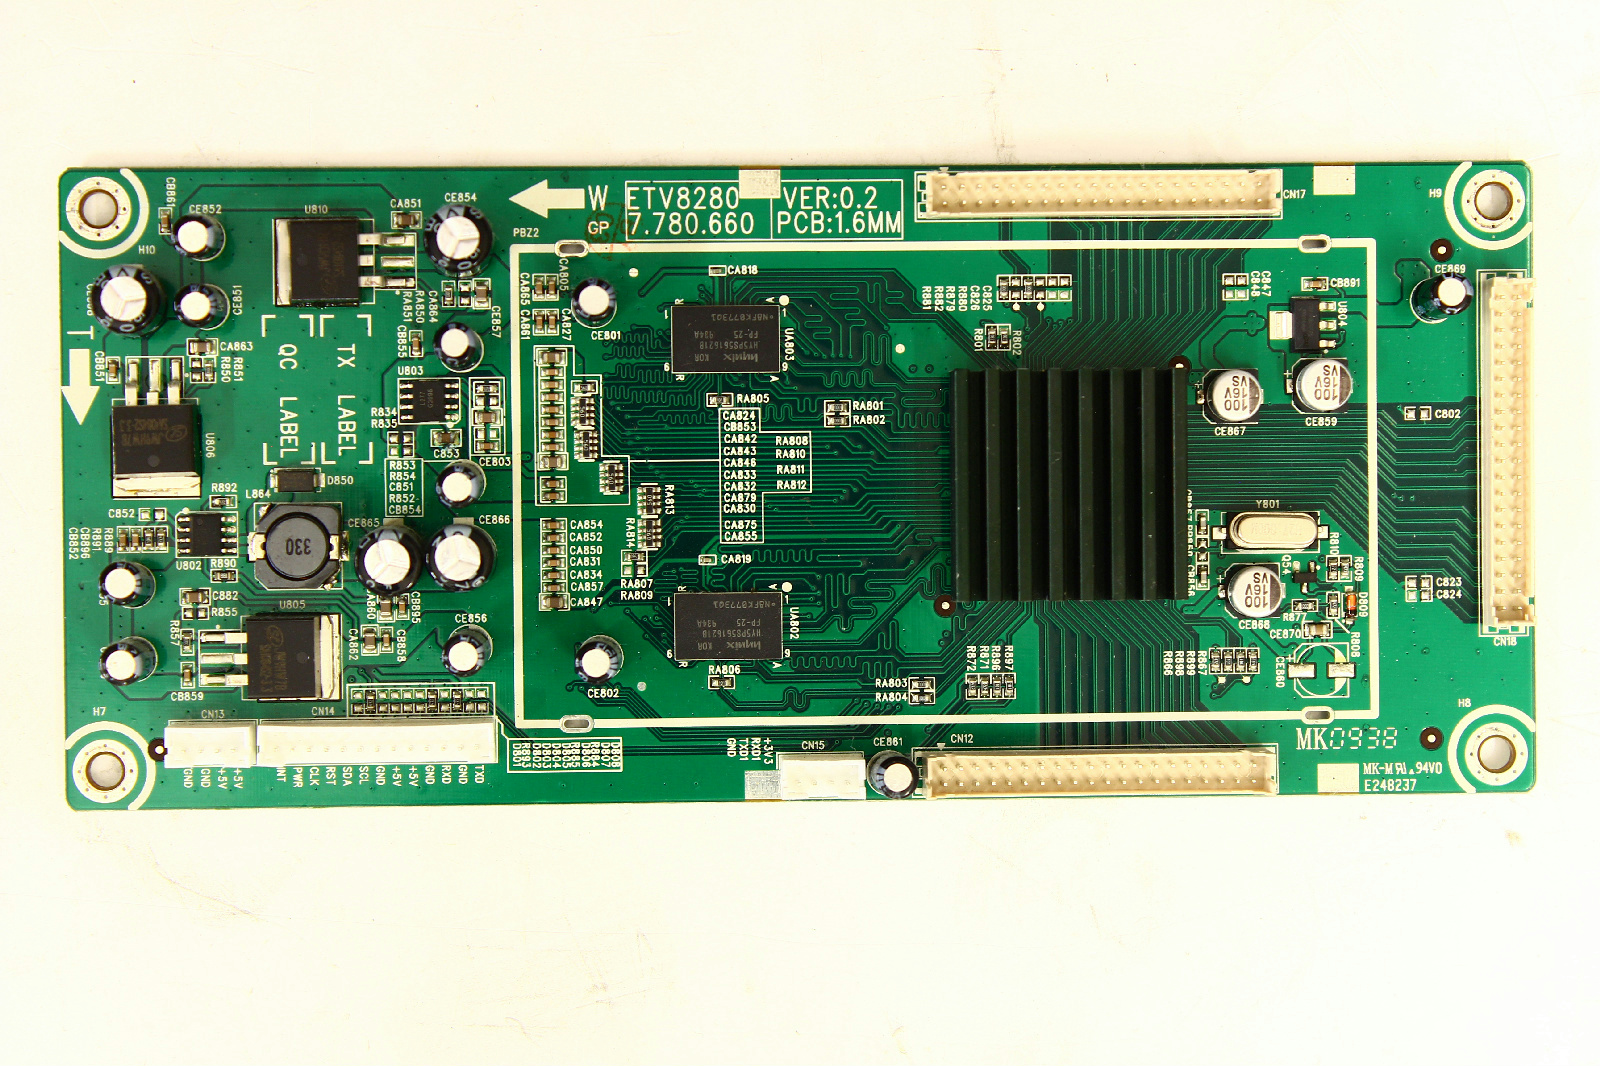 Sceptre X460bv F120 Circuit Board Etv8280 Tvparts At Tvpartsinstock How Do You Make A